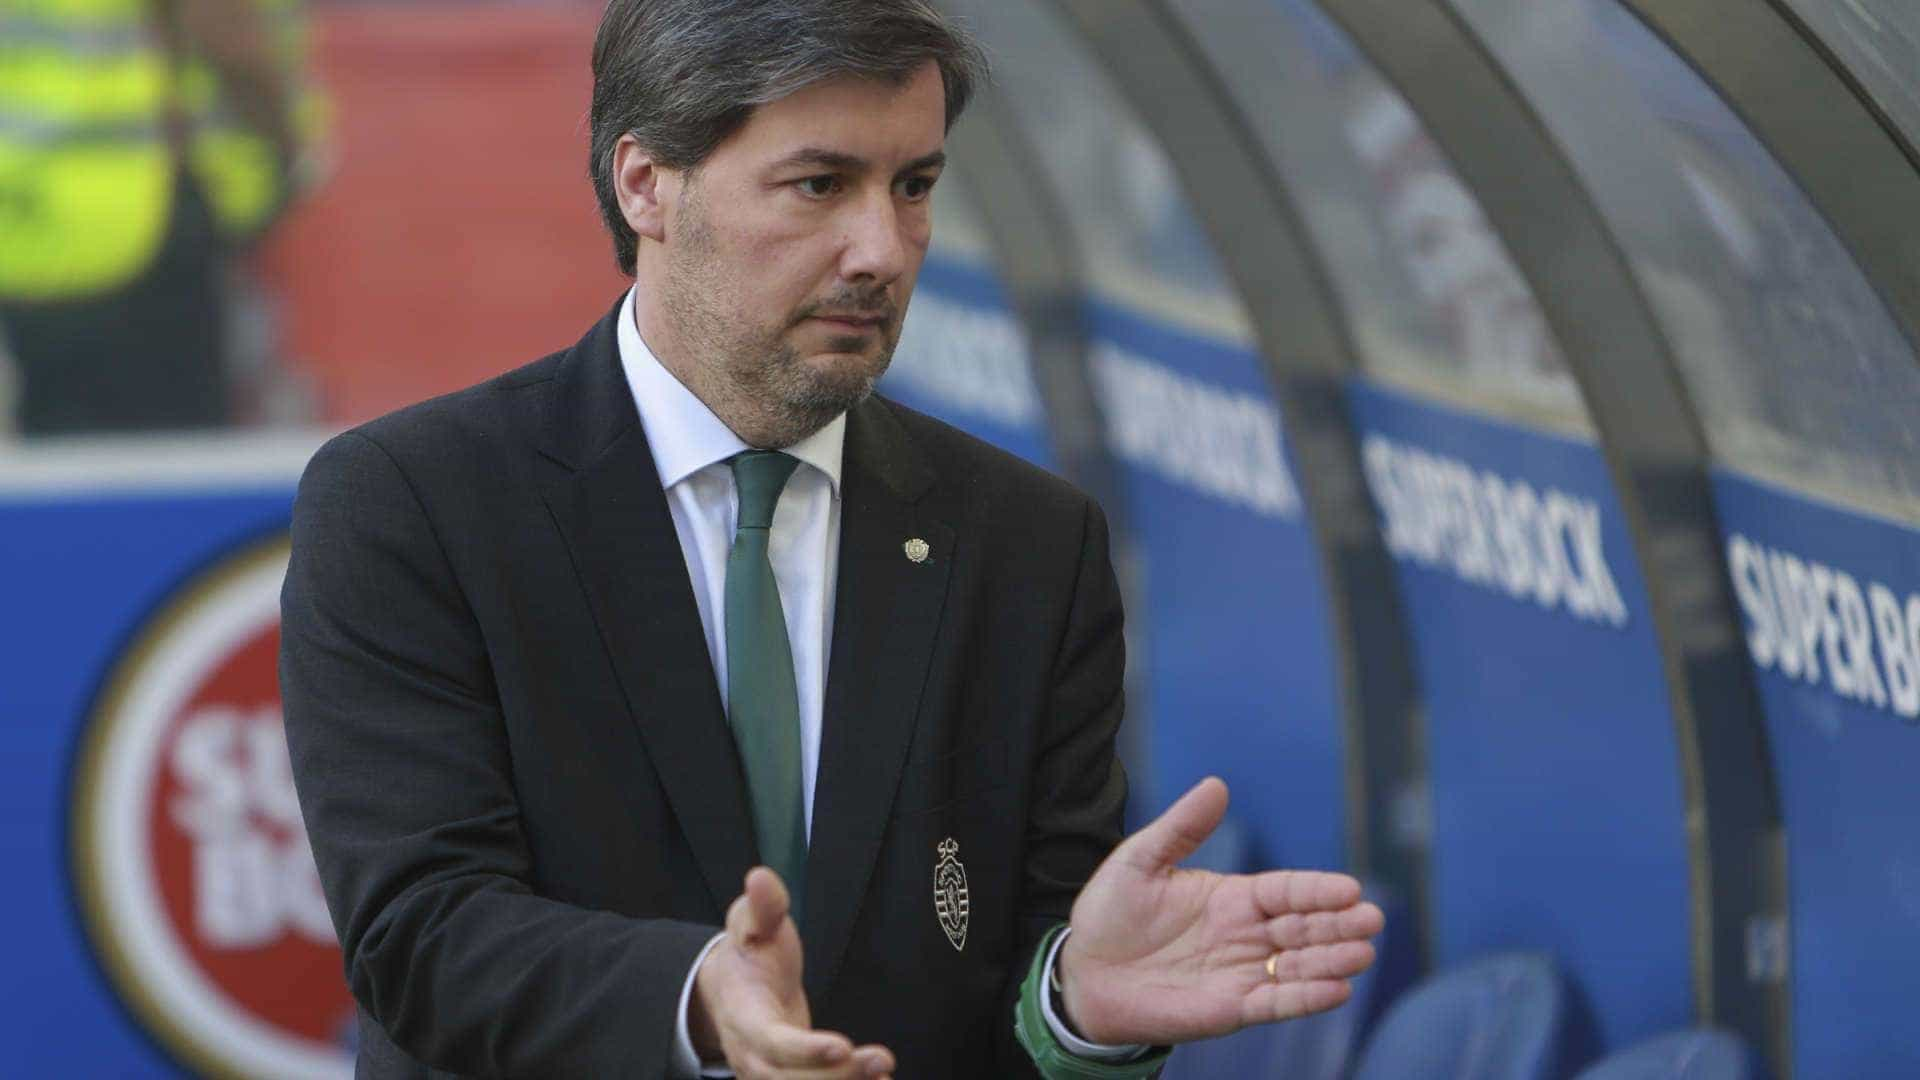 Suspeito de mandar agredir jogadores, ex-presidente do Sporting é preso